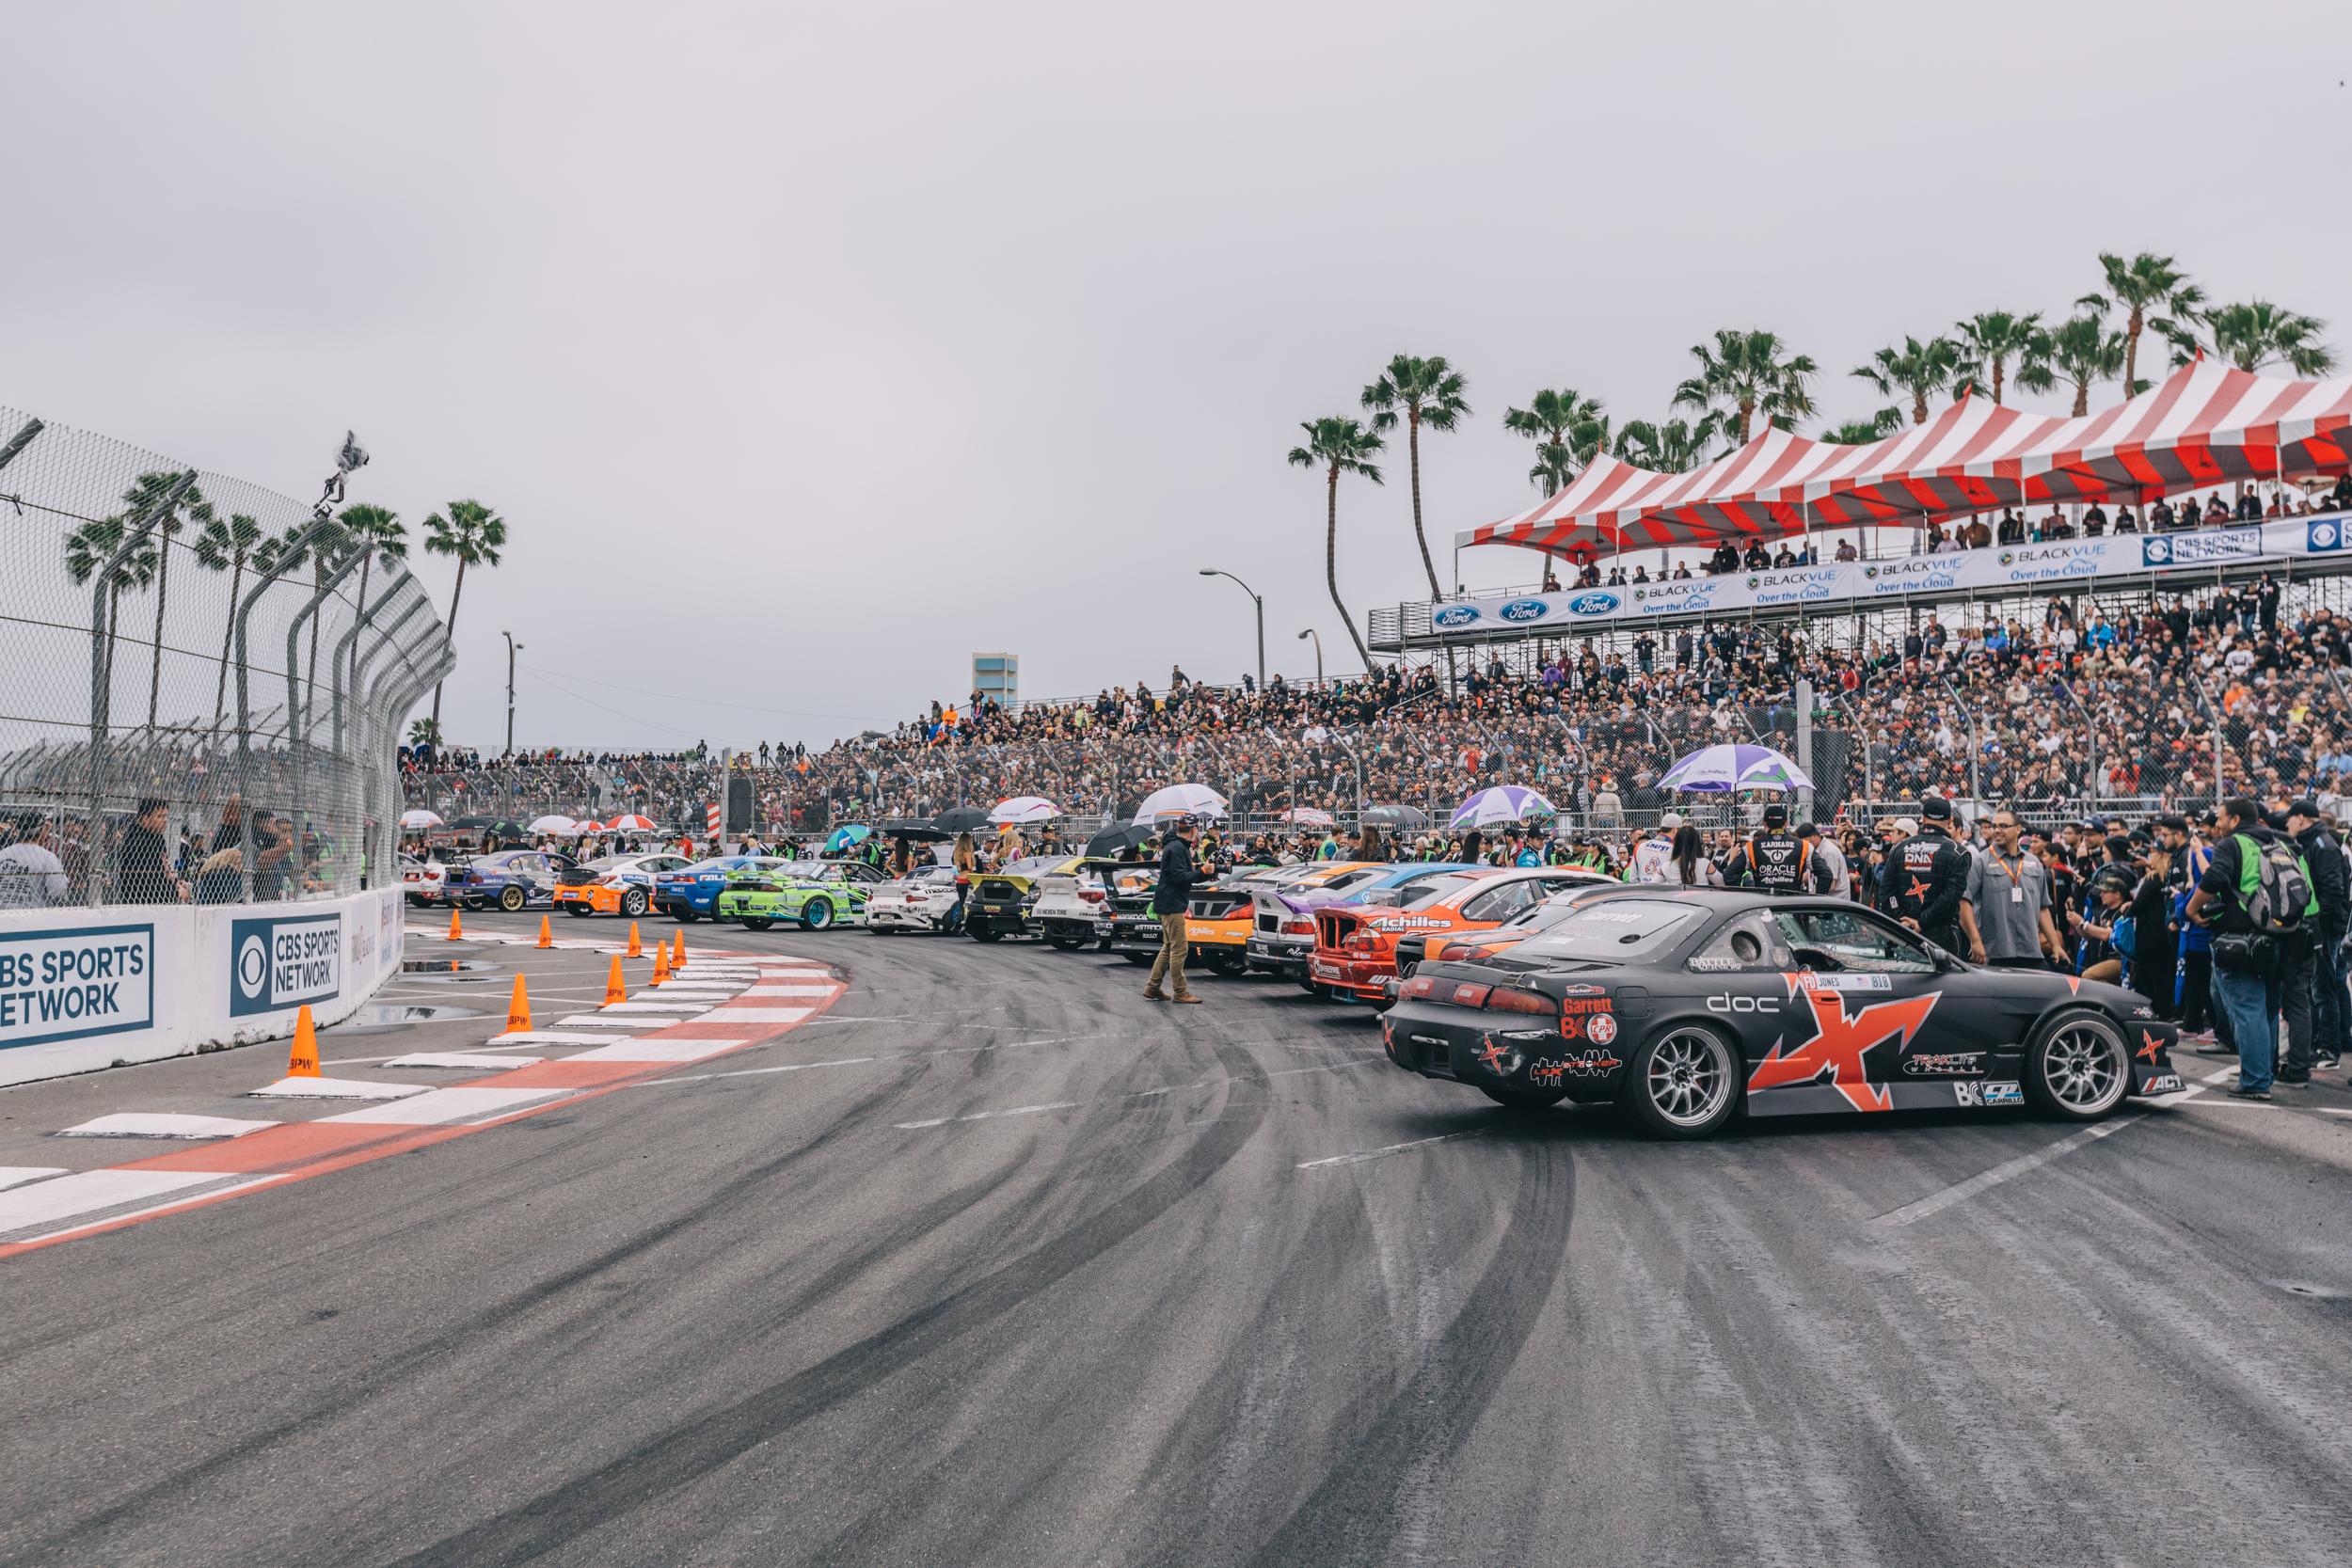 Formula Drift Long Beach Top 16 presentation on the streets of Long Beach, CA.